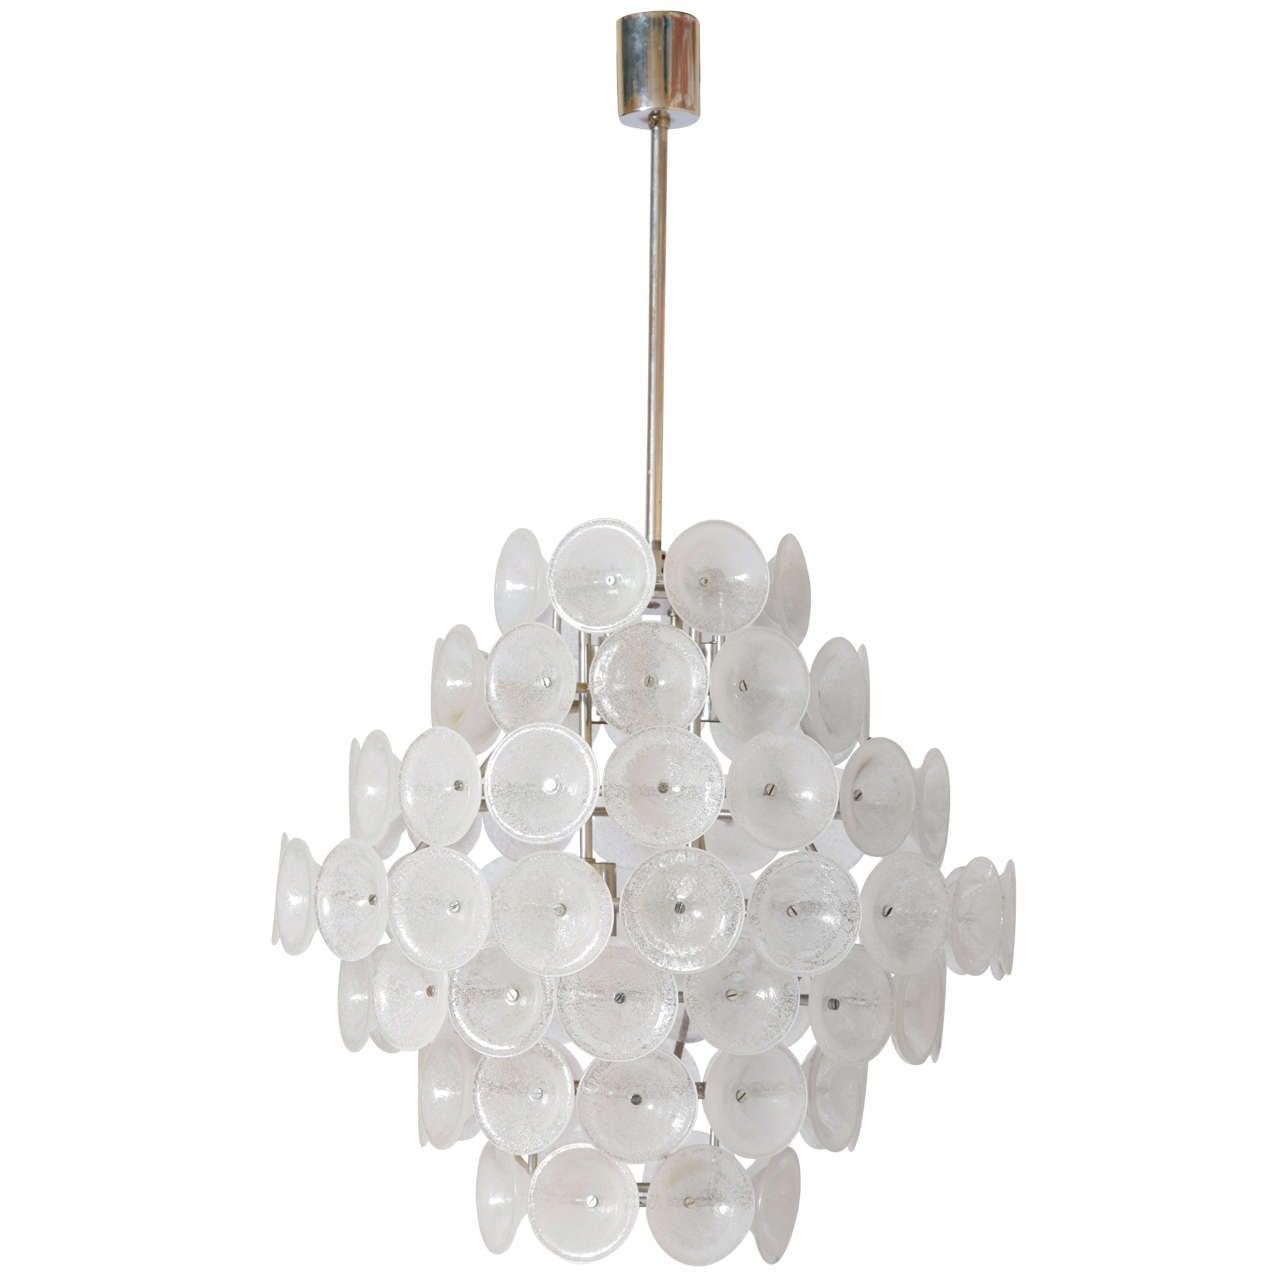 Gino vistosi chandelier for venini murano glass drop 1960s for sale executive vistosi ice glass disc chandelier aloadofball Images